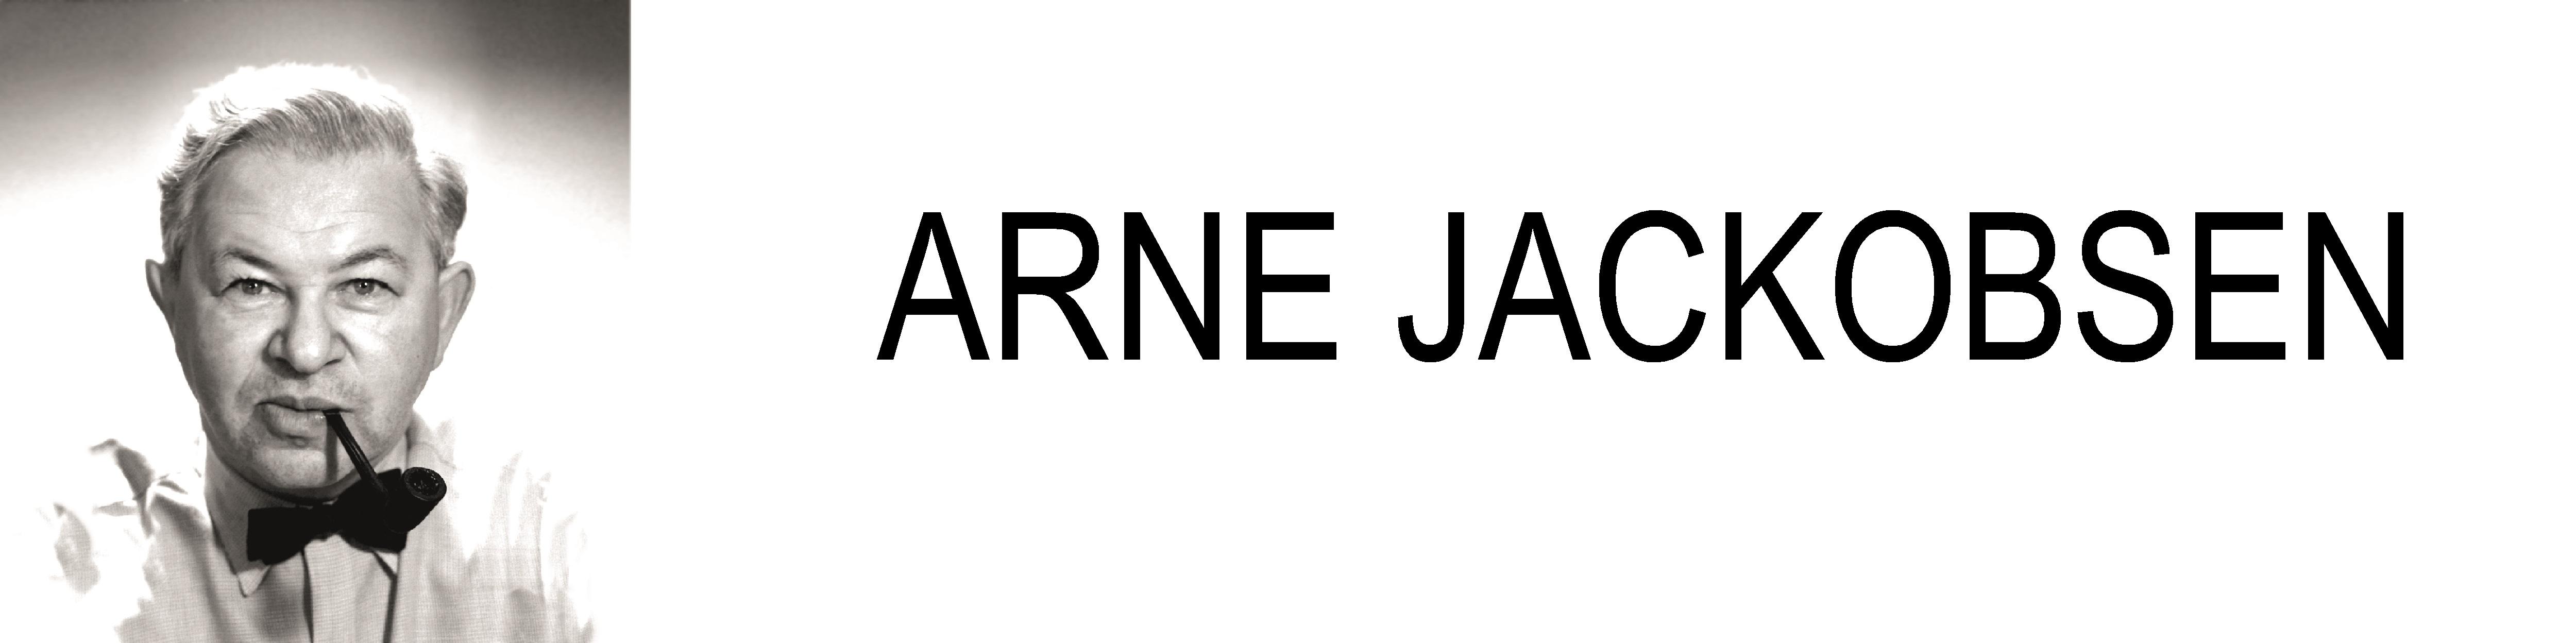 arne jacobsen products the copenhagen house. Black Bedroom Furniture Sets. Home Design Ideas